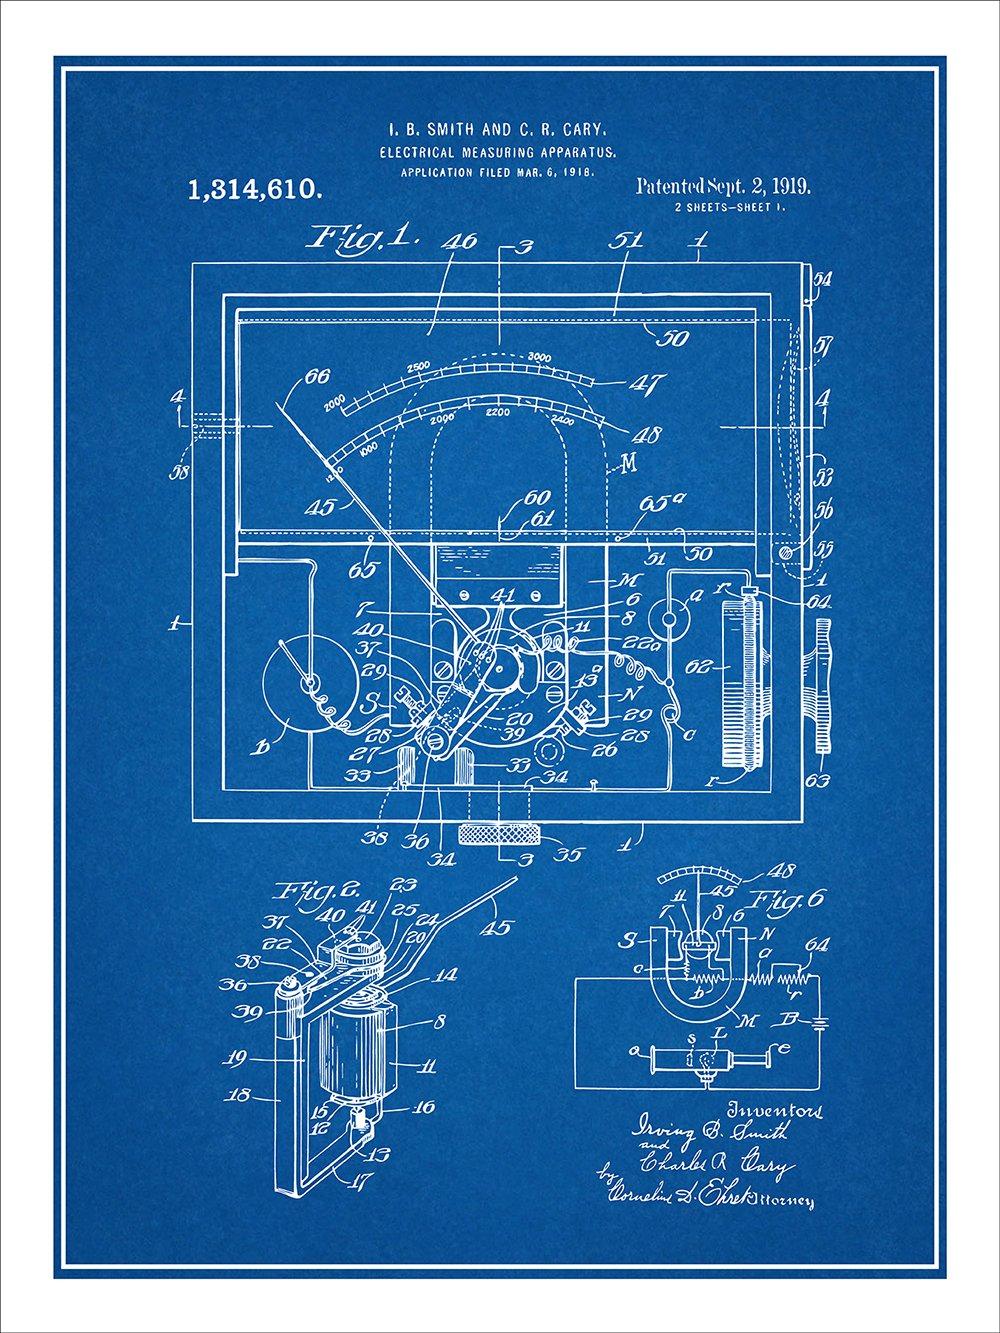 Amazon.com: 1919 Electrical Meter Galvanometer Voltmeter ... on siding blueprints, machining blueprints, design blueprints, welding fabrication blueprints, engine blueprints, water heater blueprints, plumbing blueprints, industrial blueprints, mechanical blueprints, electronic blueprints, house blueprints, countertop blueprints, manufacturing blueprints, hydraulic blueprints, engineering blueprints, home blueprints, foundation blueprints, structural blueprints, automotive blueprints, computer blueprints,